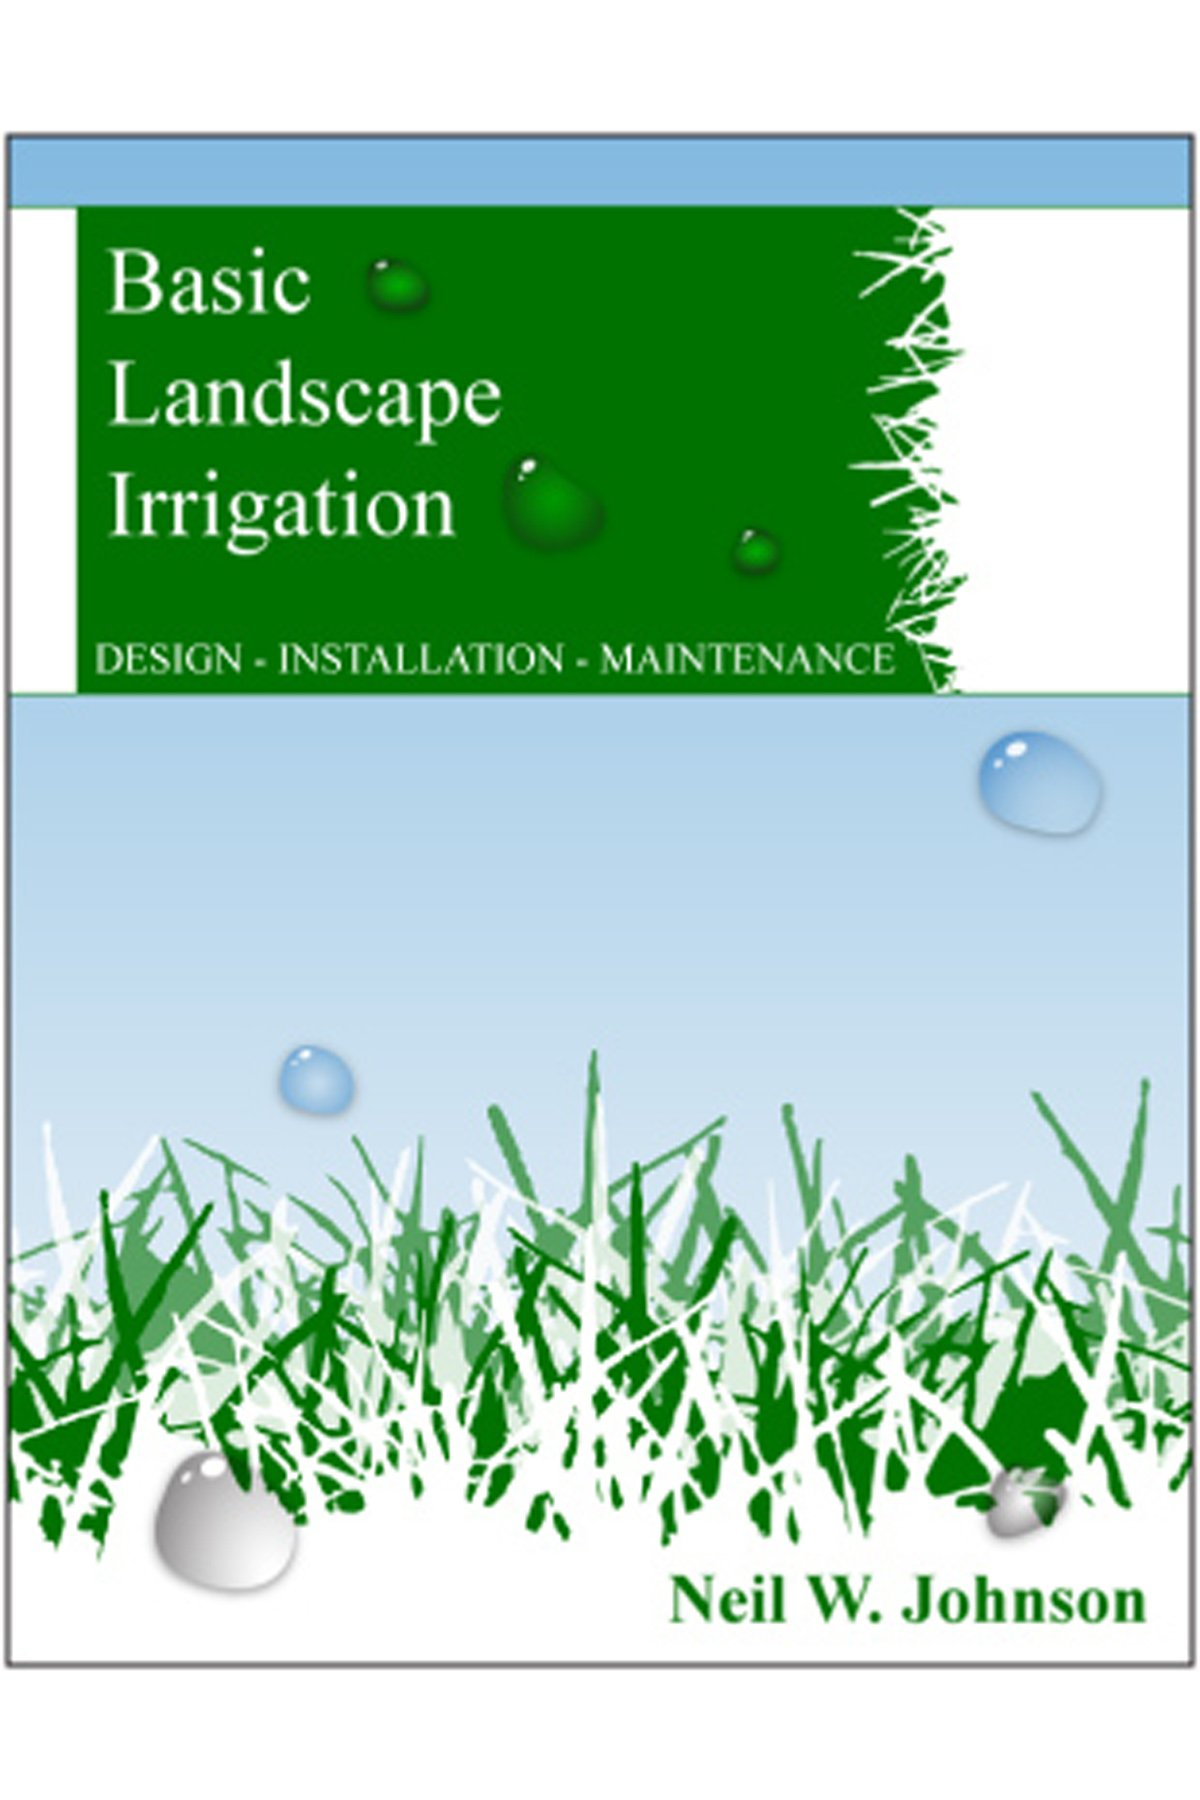 Amazon.com: Basic Landscape Irrigation : Design - Installation ...